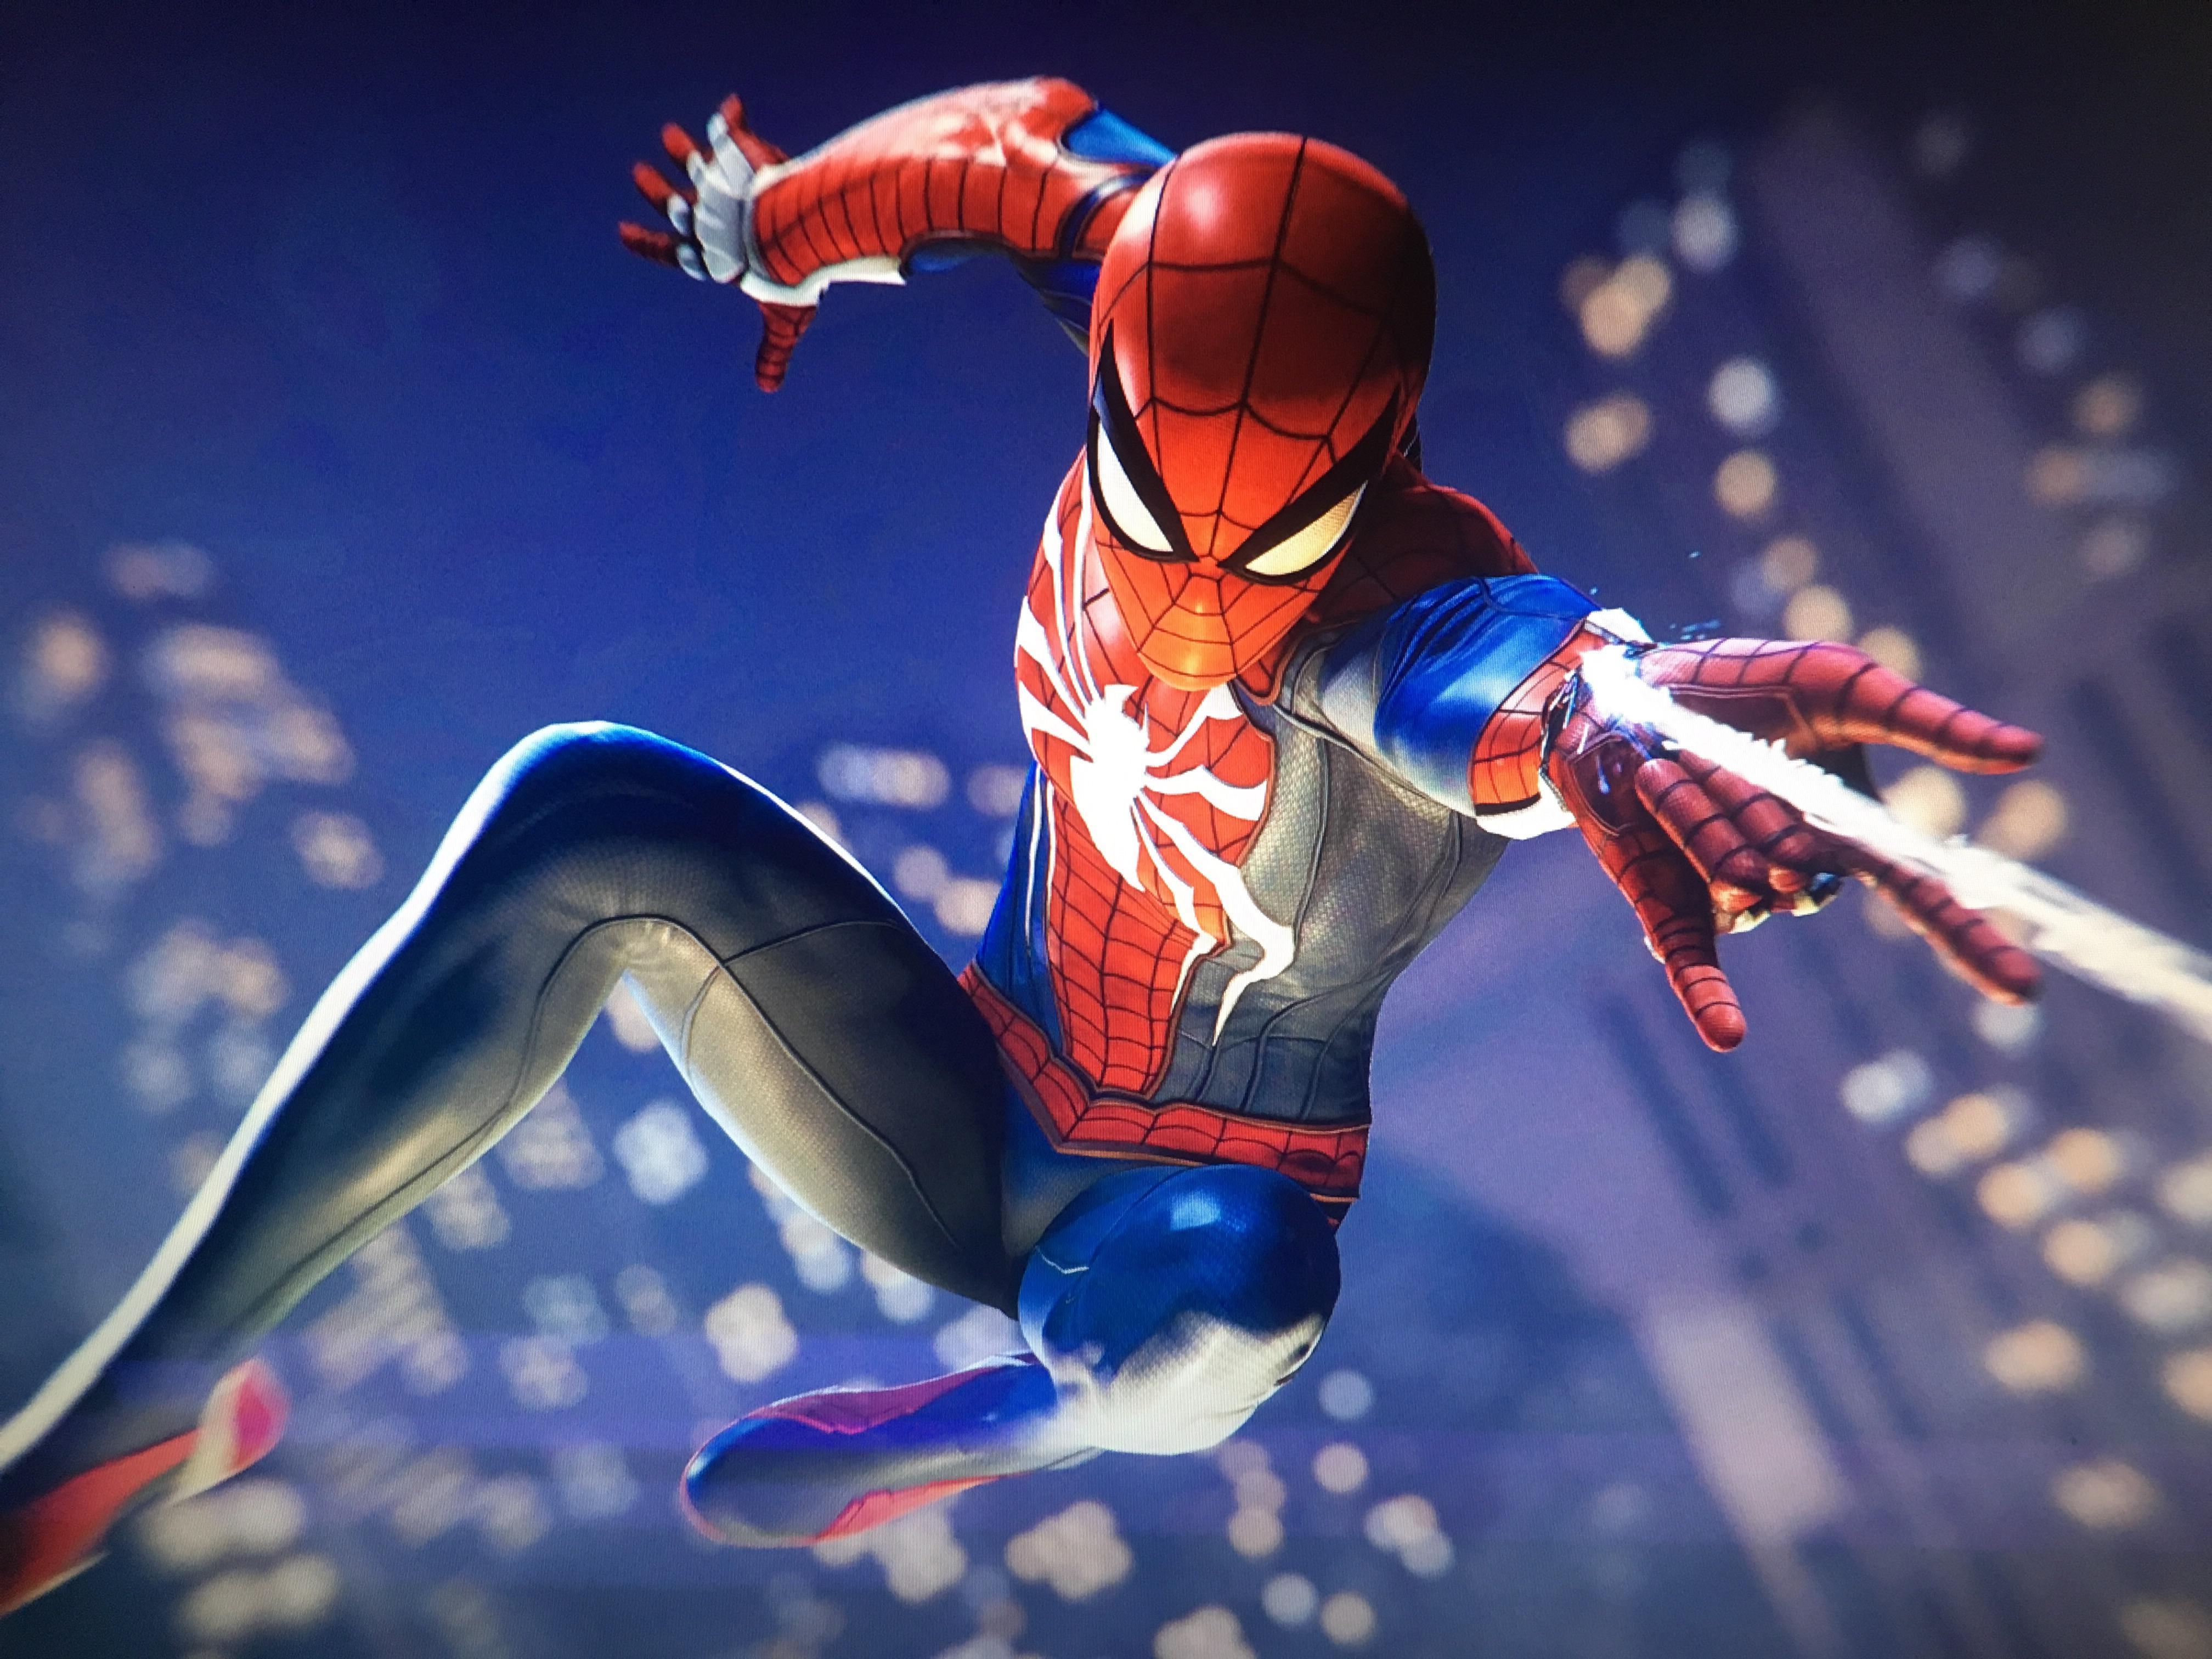 Marvel Spider-Man Wallpapers - Wallpaper Cave